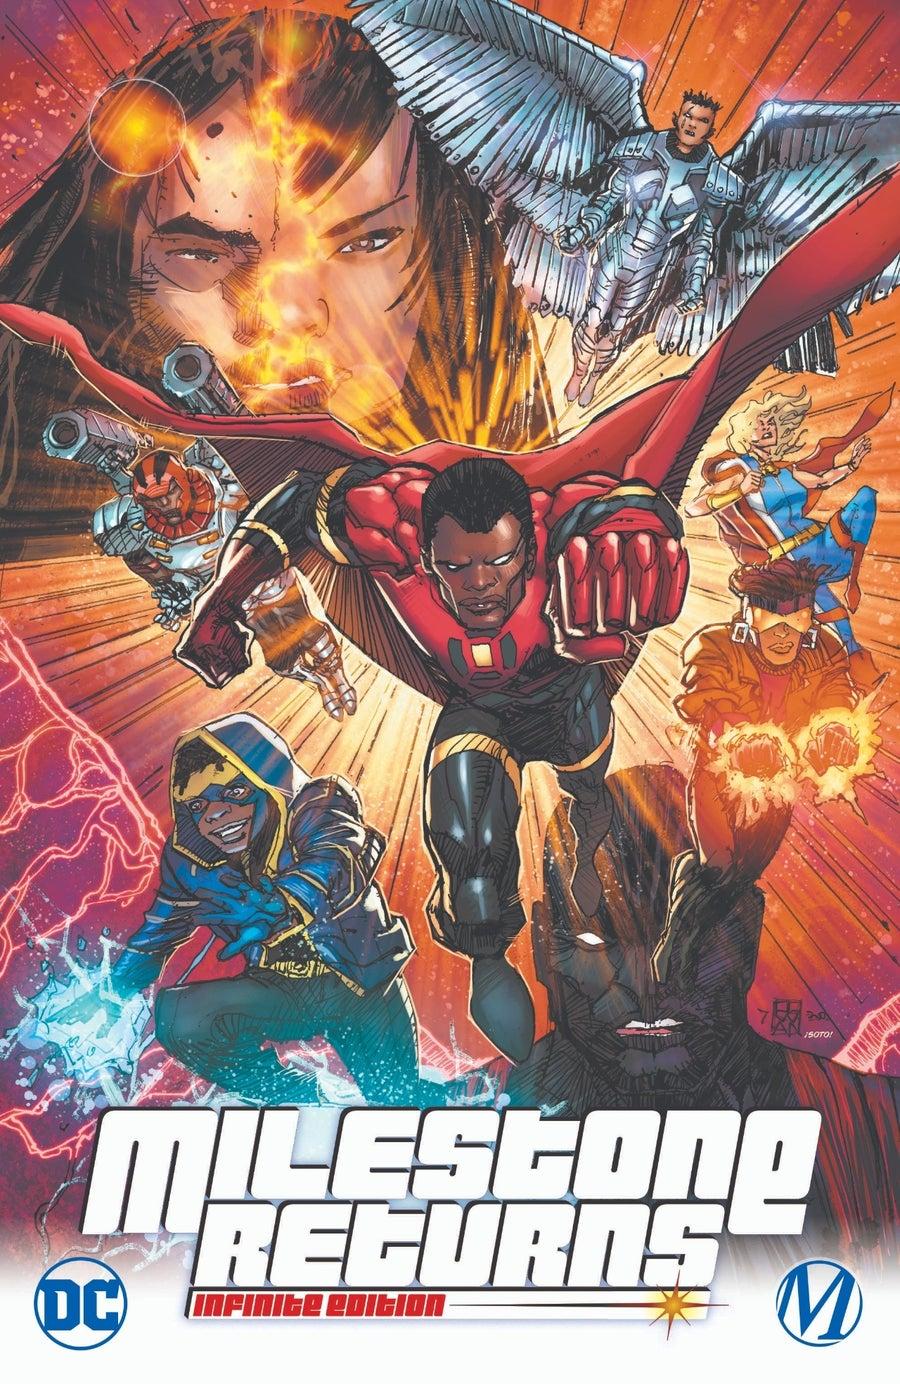 dc comics milestone returns infinite edition